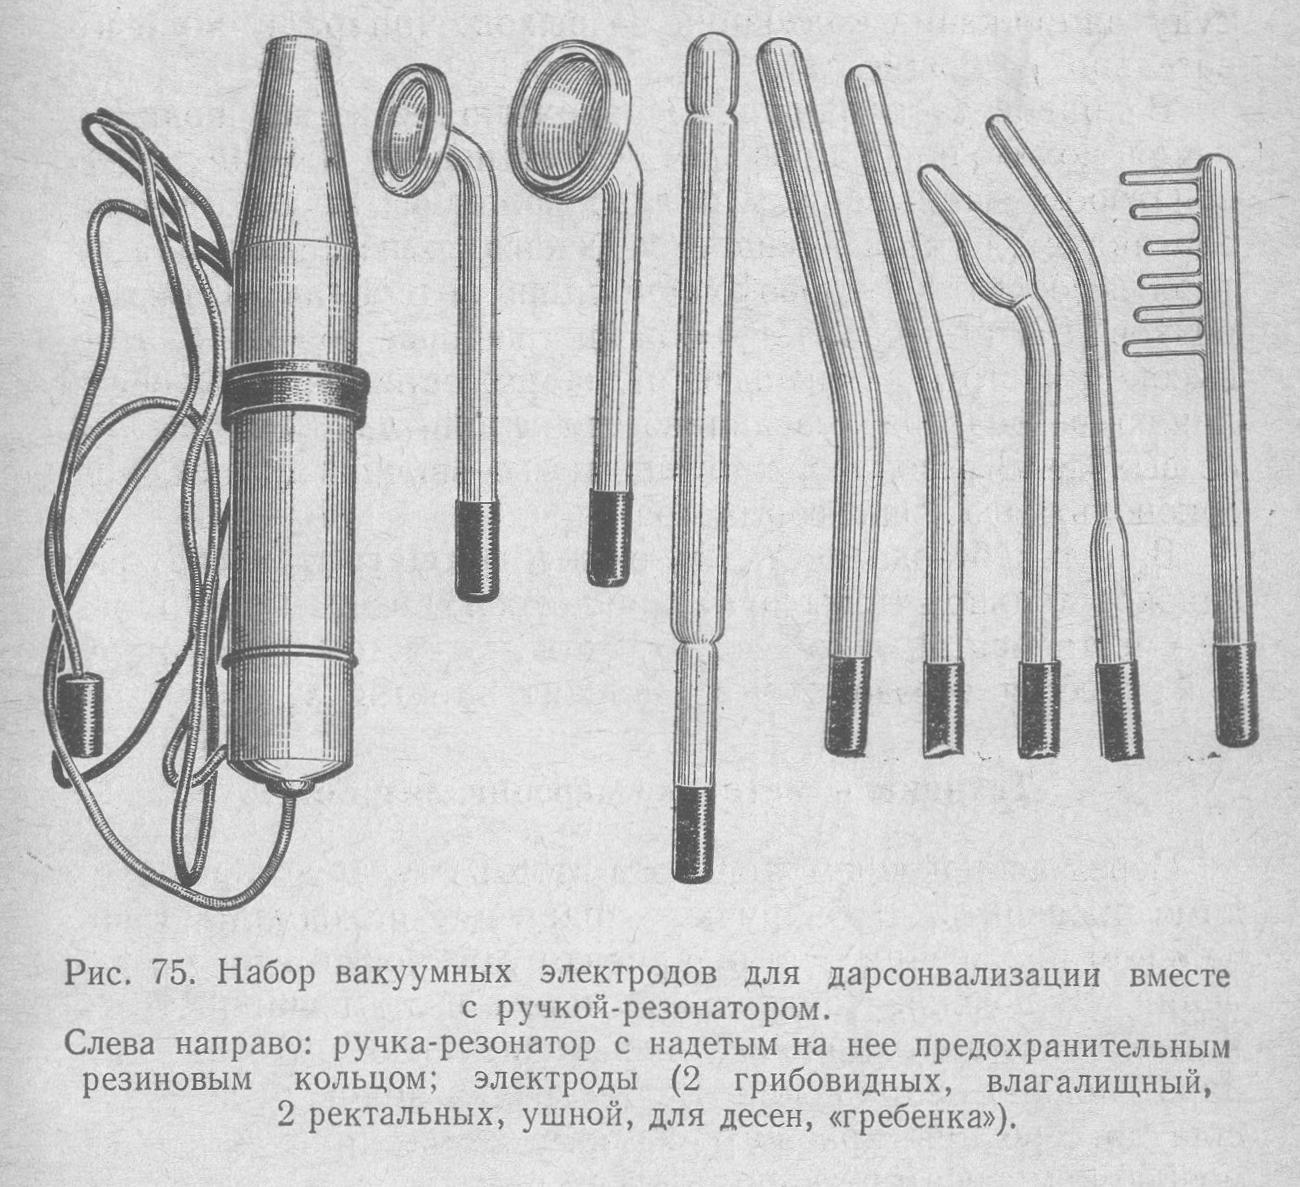 Набор насадок для старого дарсонвализатора Искра-1